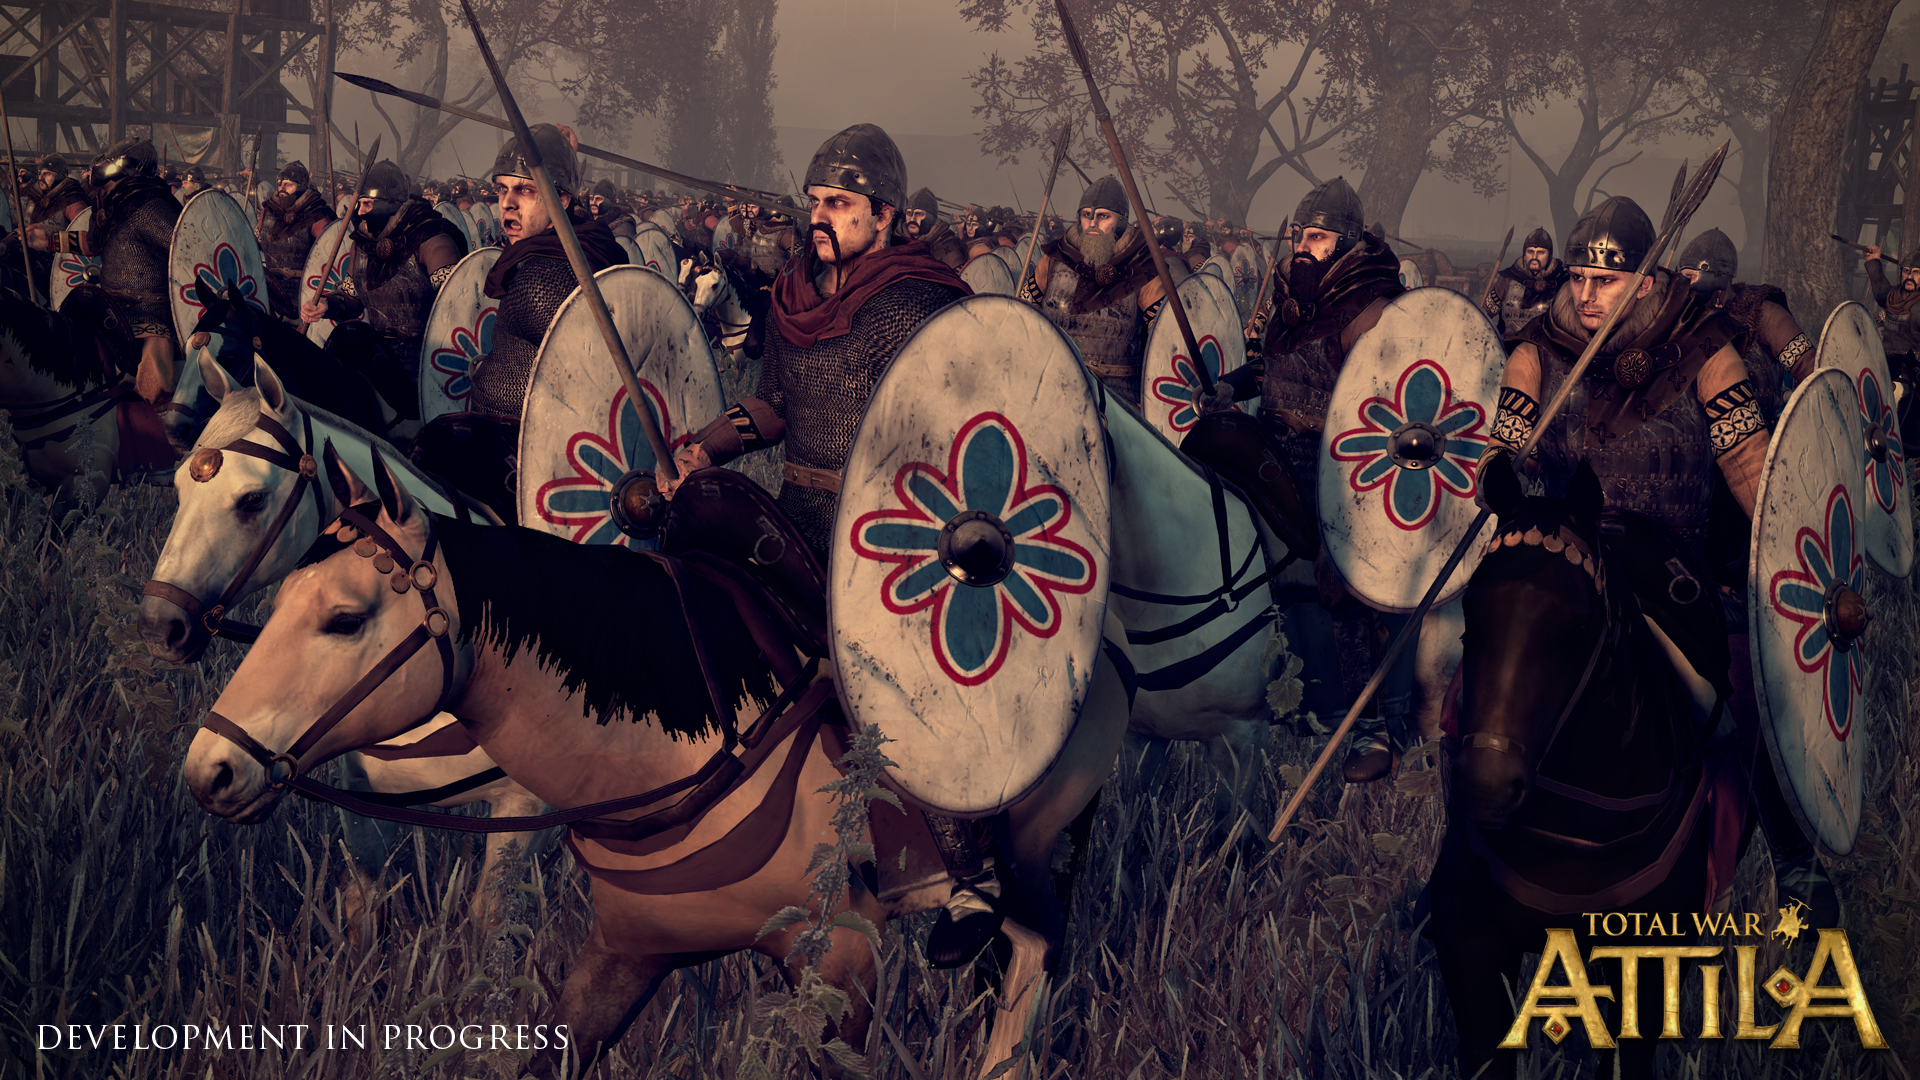 Seznam frakcí v Total War Attila 102633